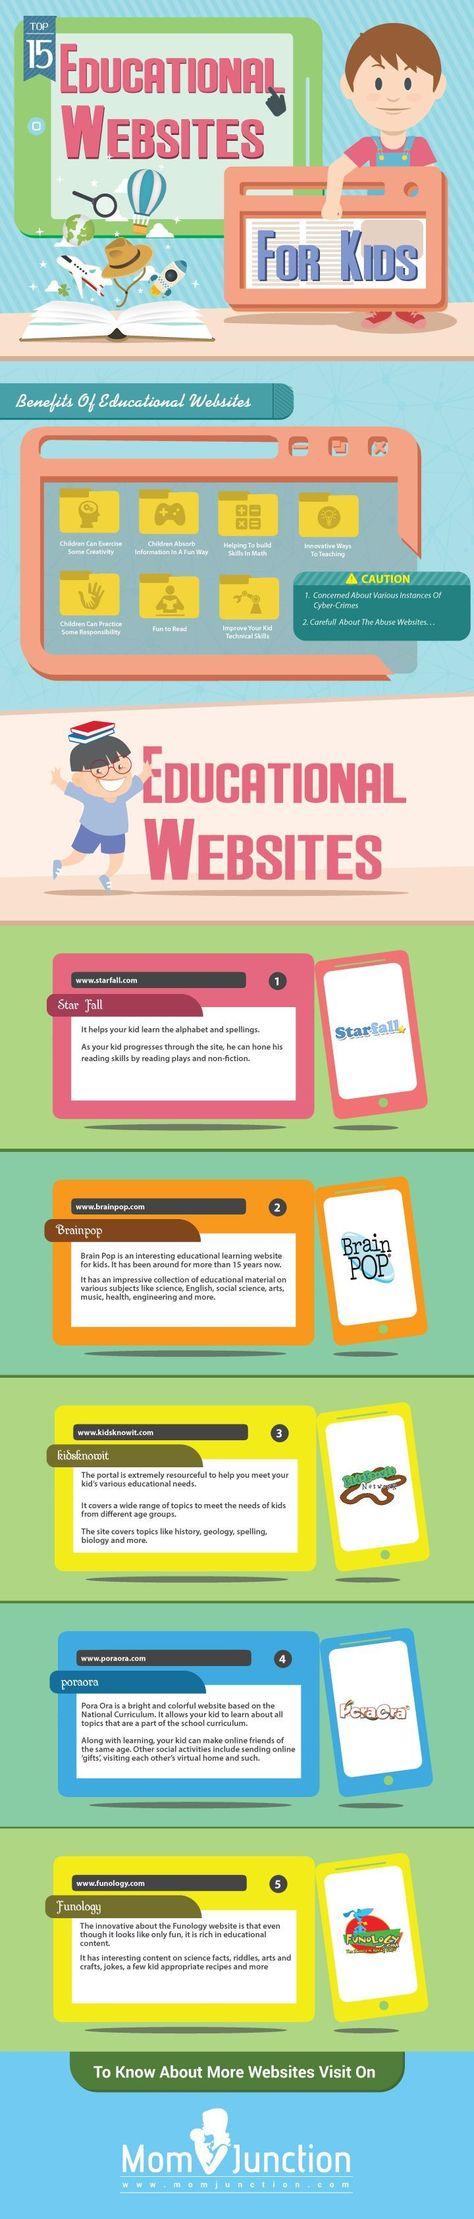 Top 15 Useful Educational Websites For Kids